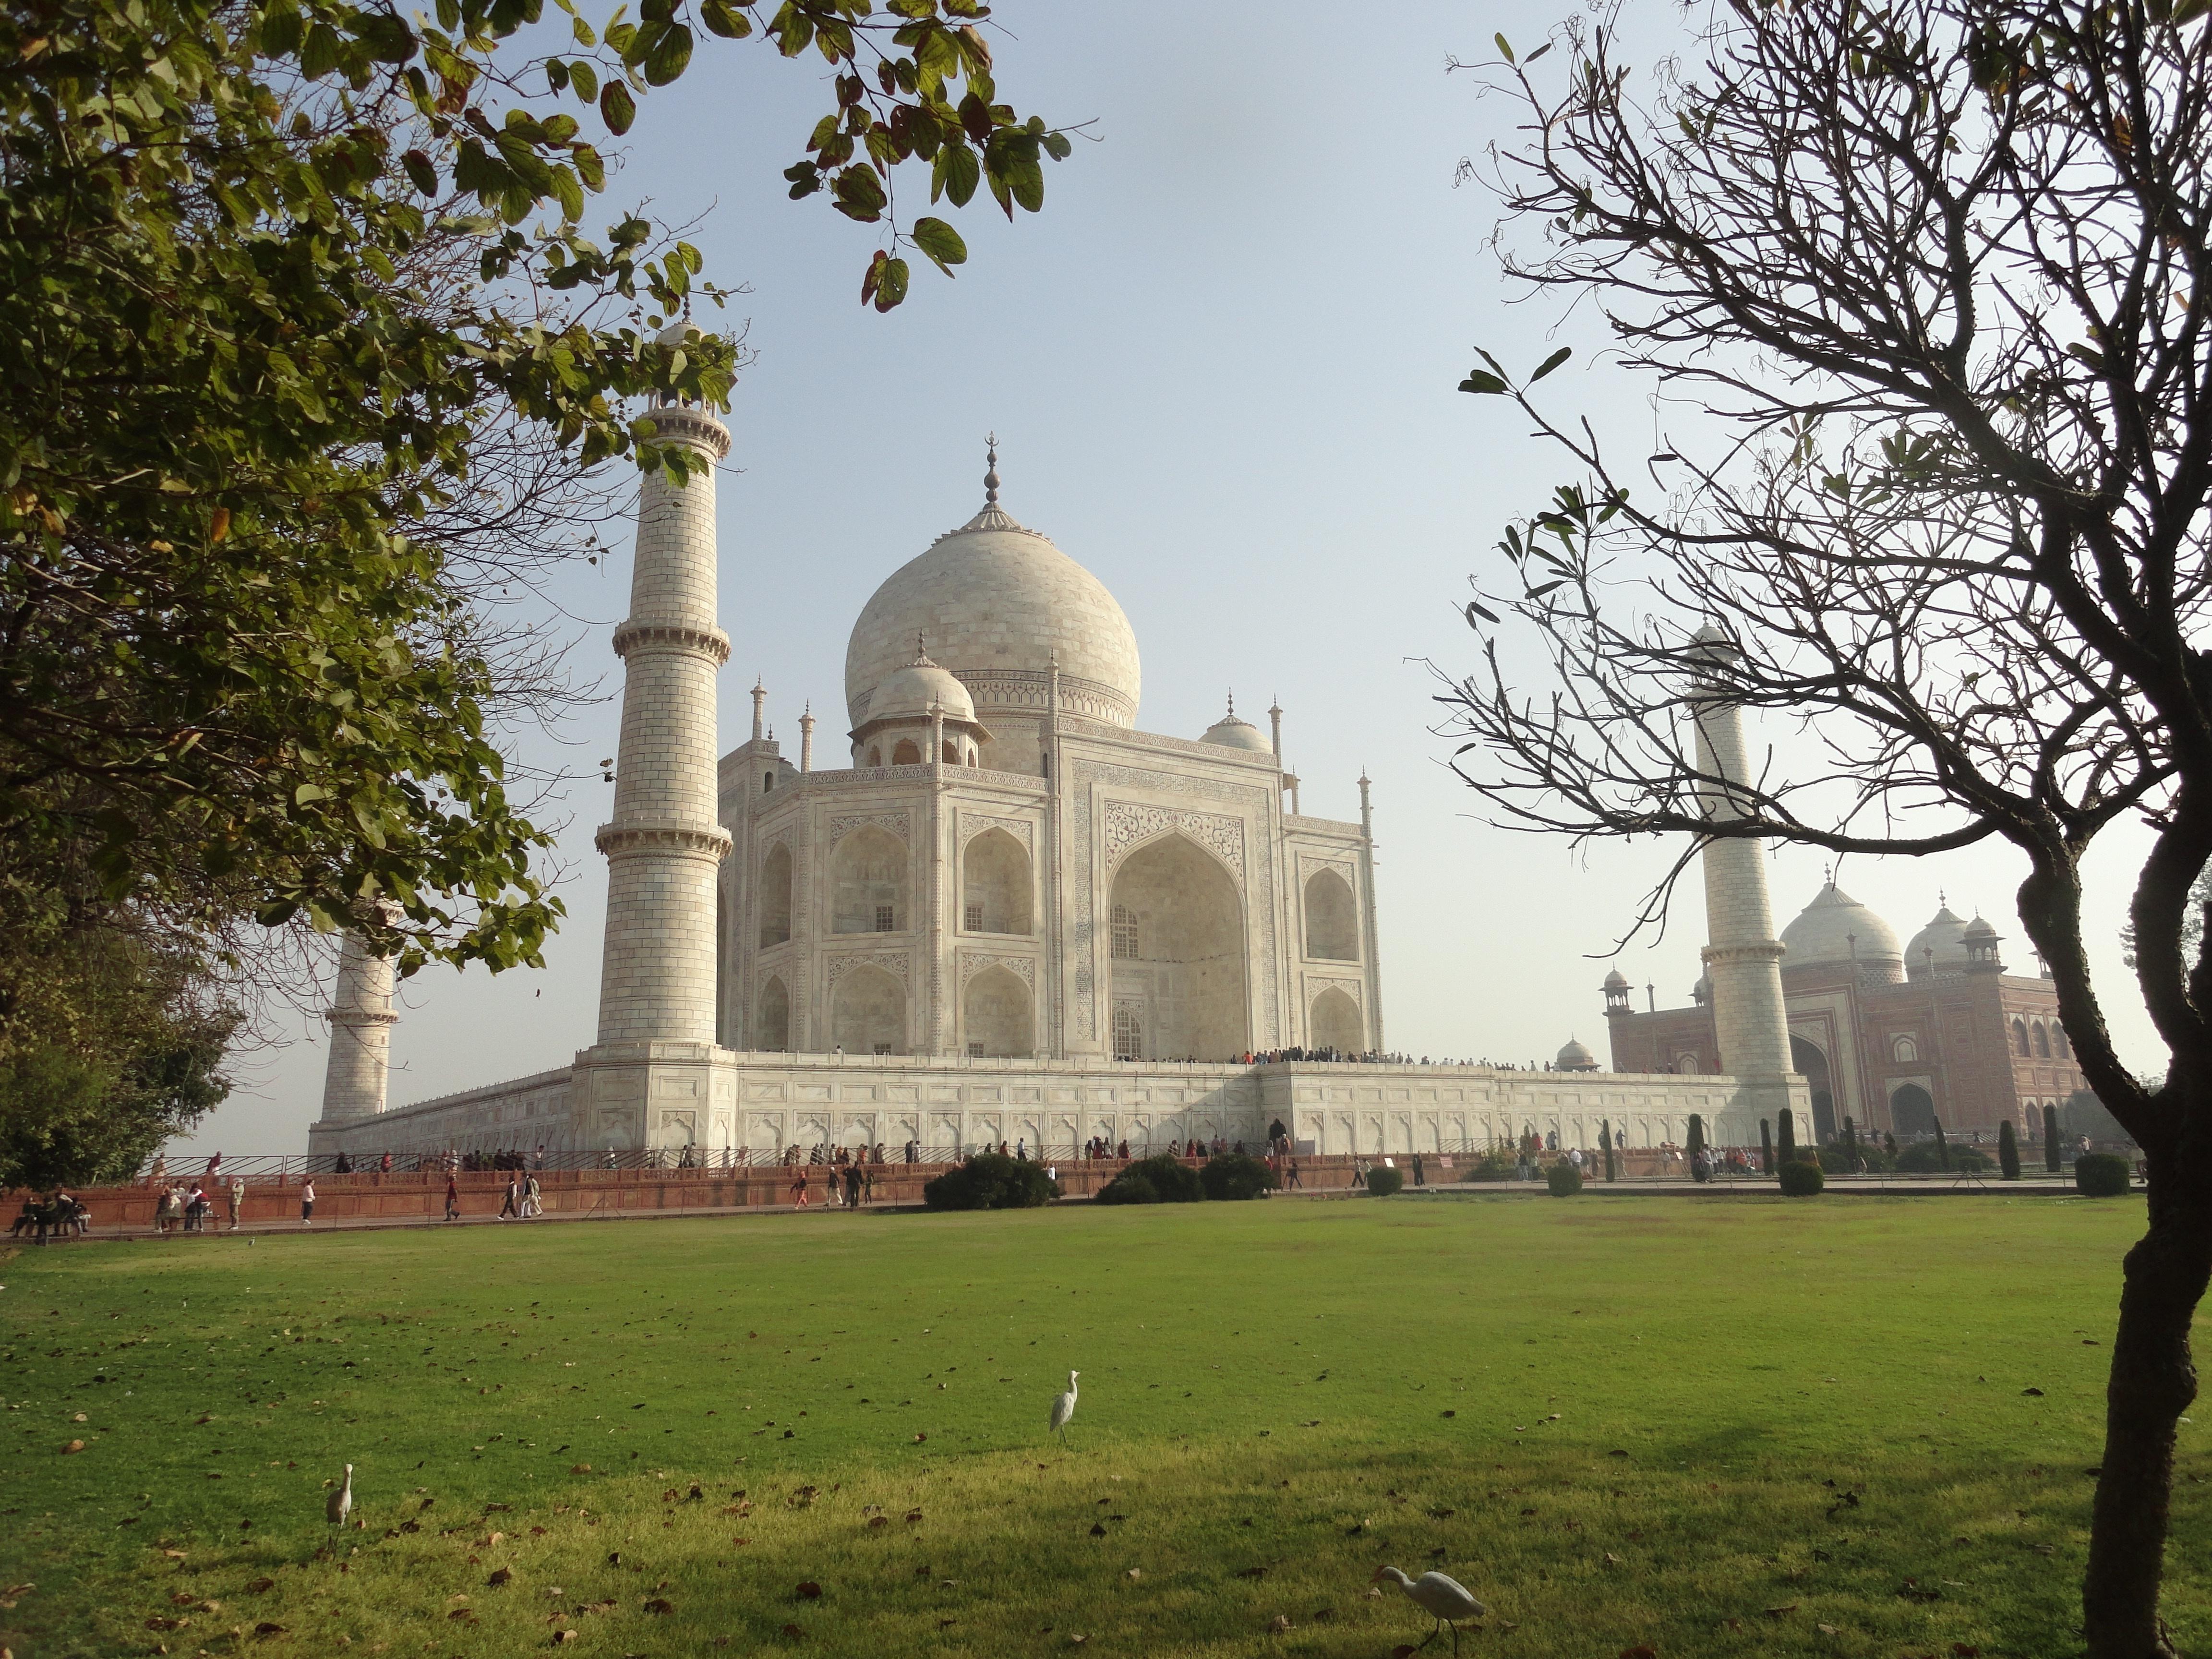 India Tour with Tiger Safari